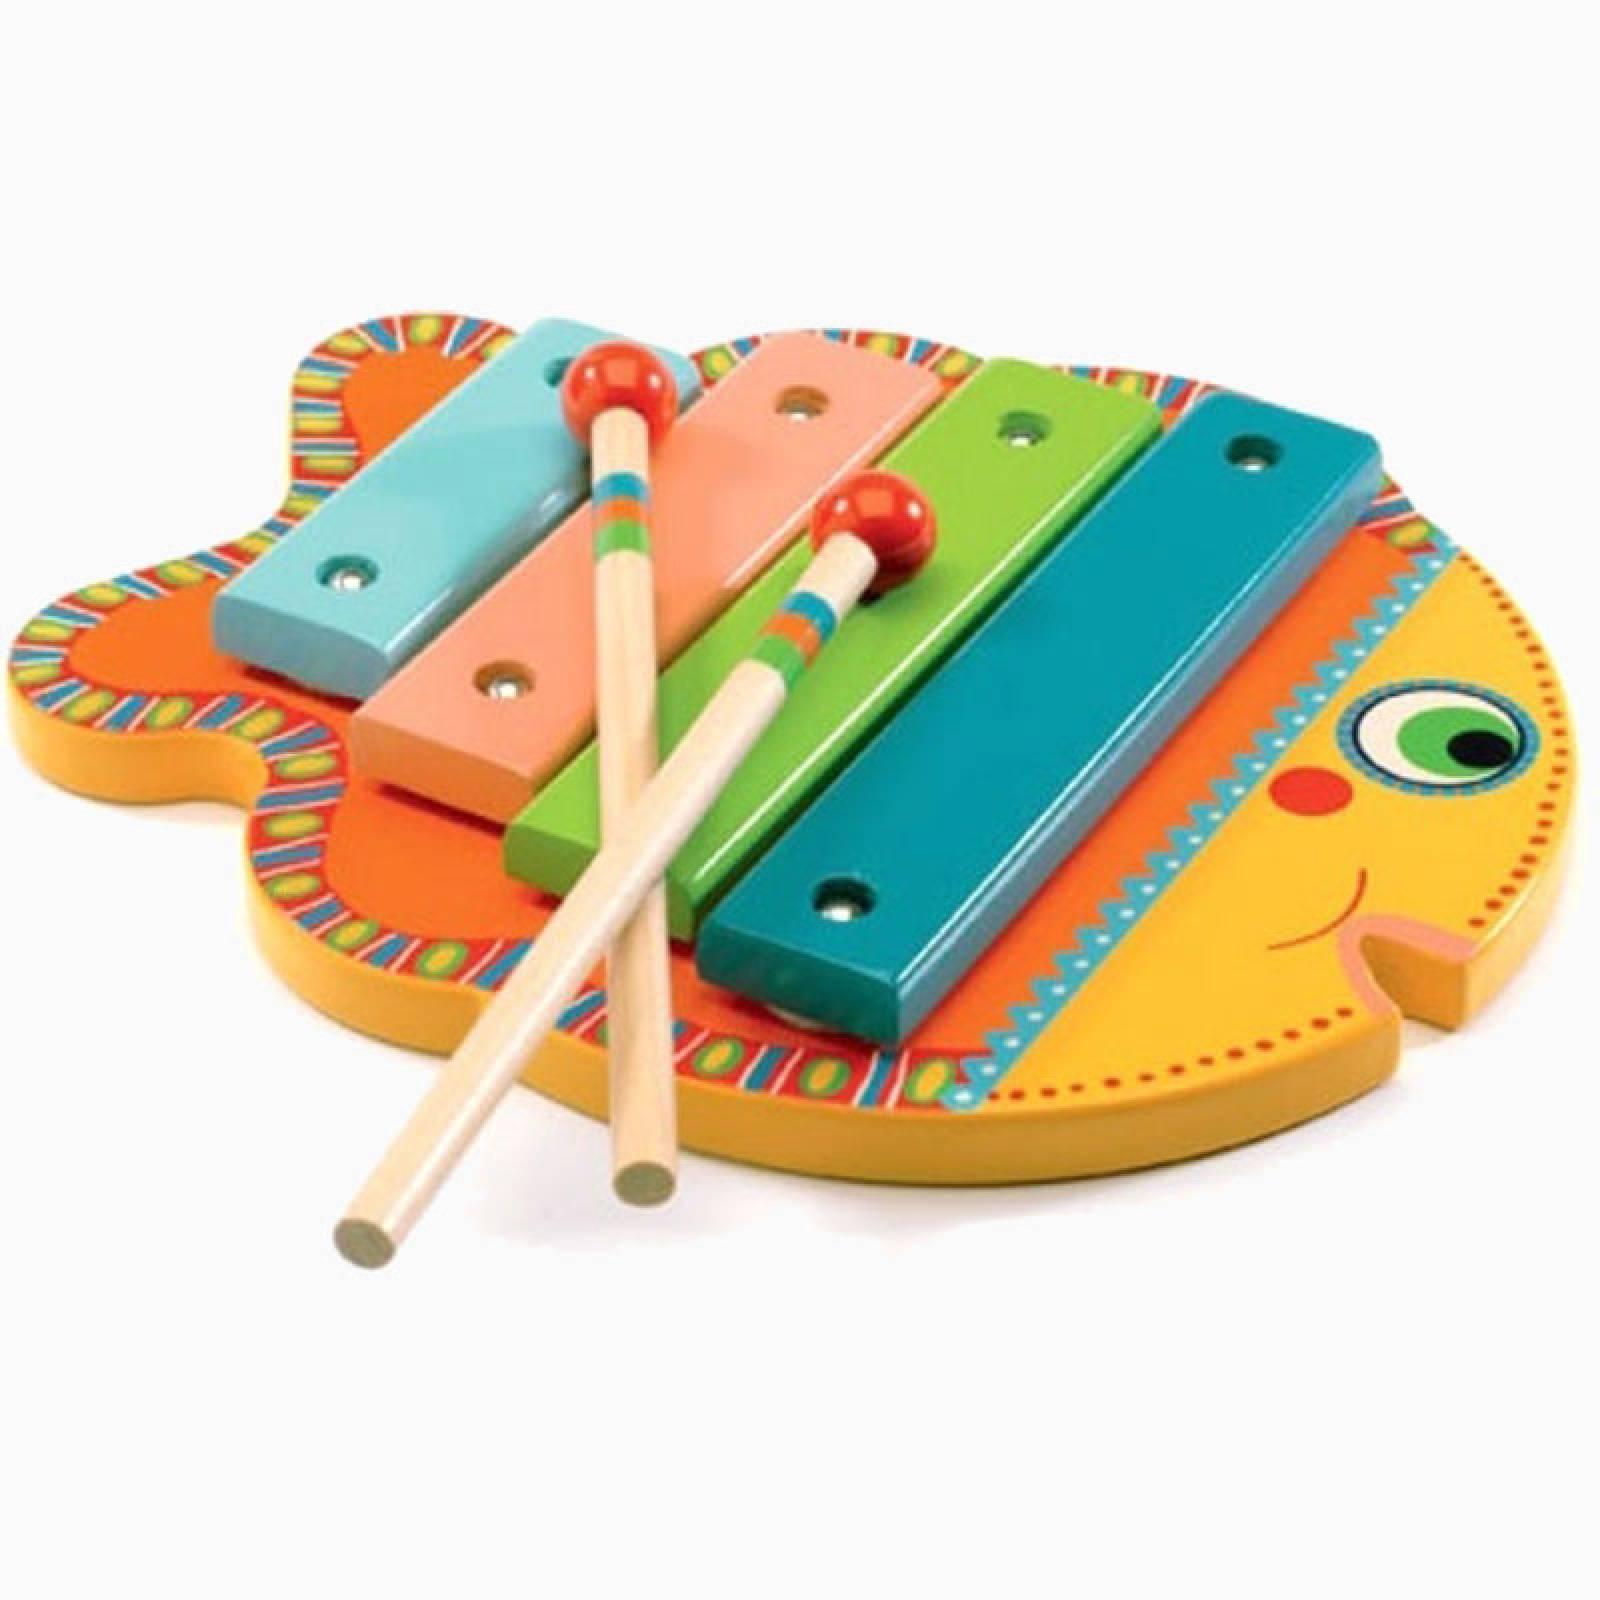 Animambo Fish Xylophone By Djeco 18m+